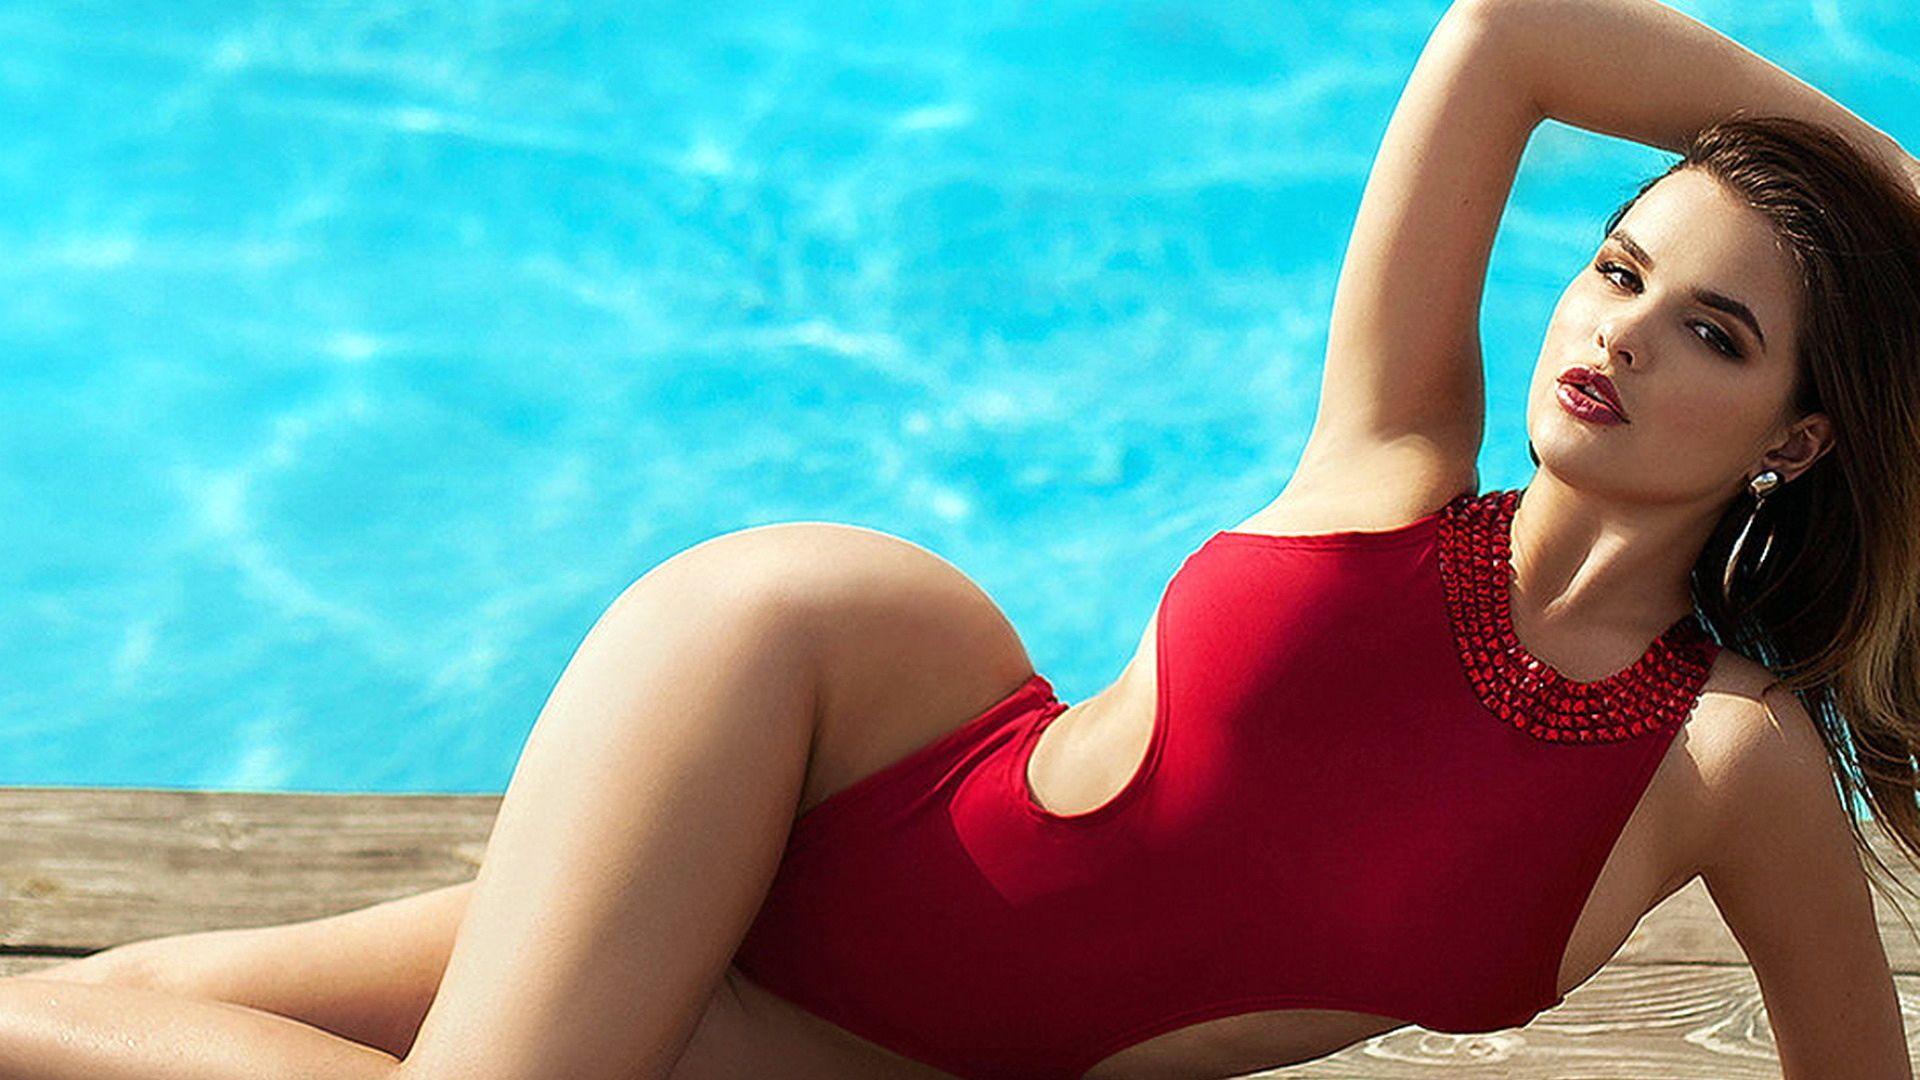 Selfie Eliya Cioccolato nudes (72 photos), Ass, Hot, Twitter, lingerie 2015